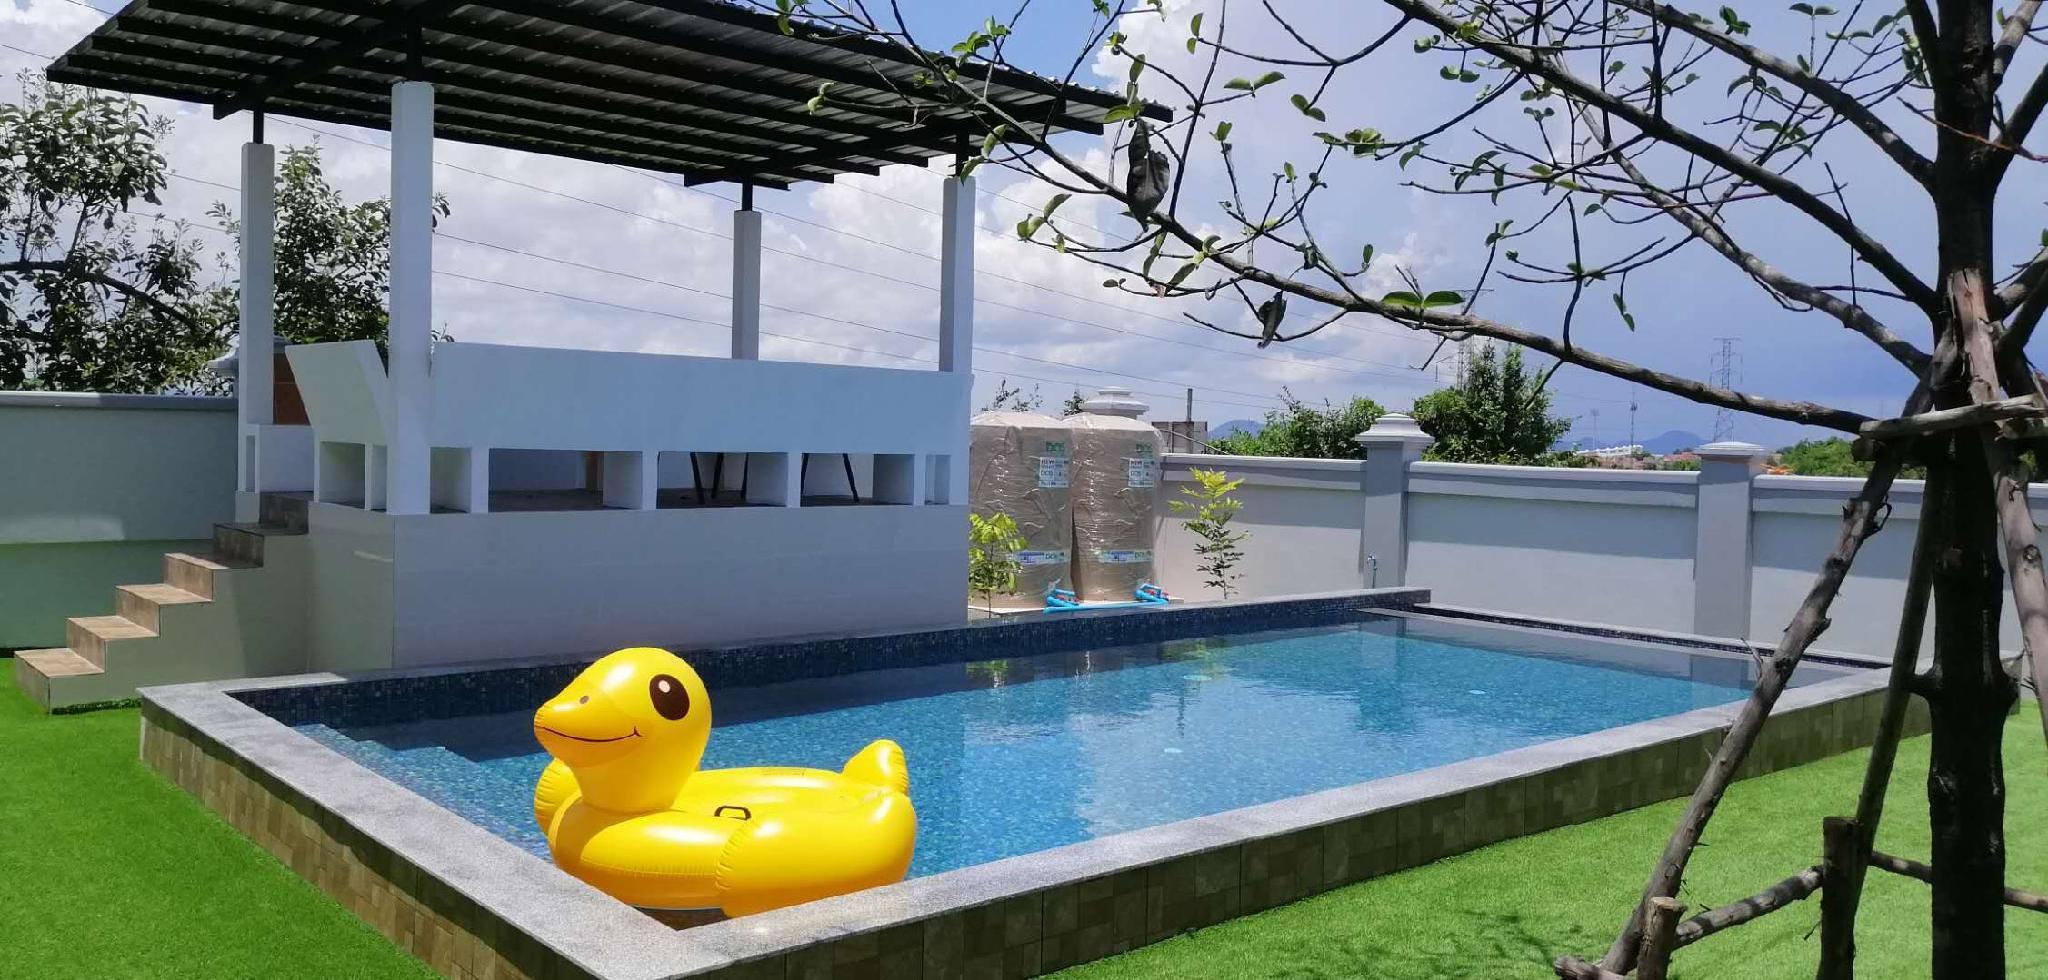 Pattaya's Top Luxury 4bedroom Pool Villa